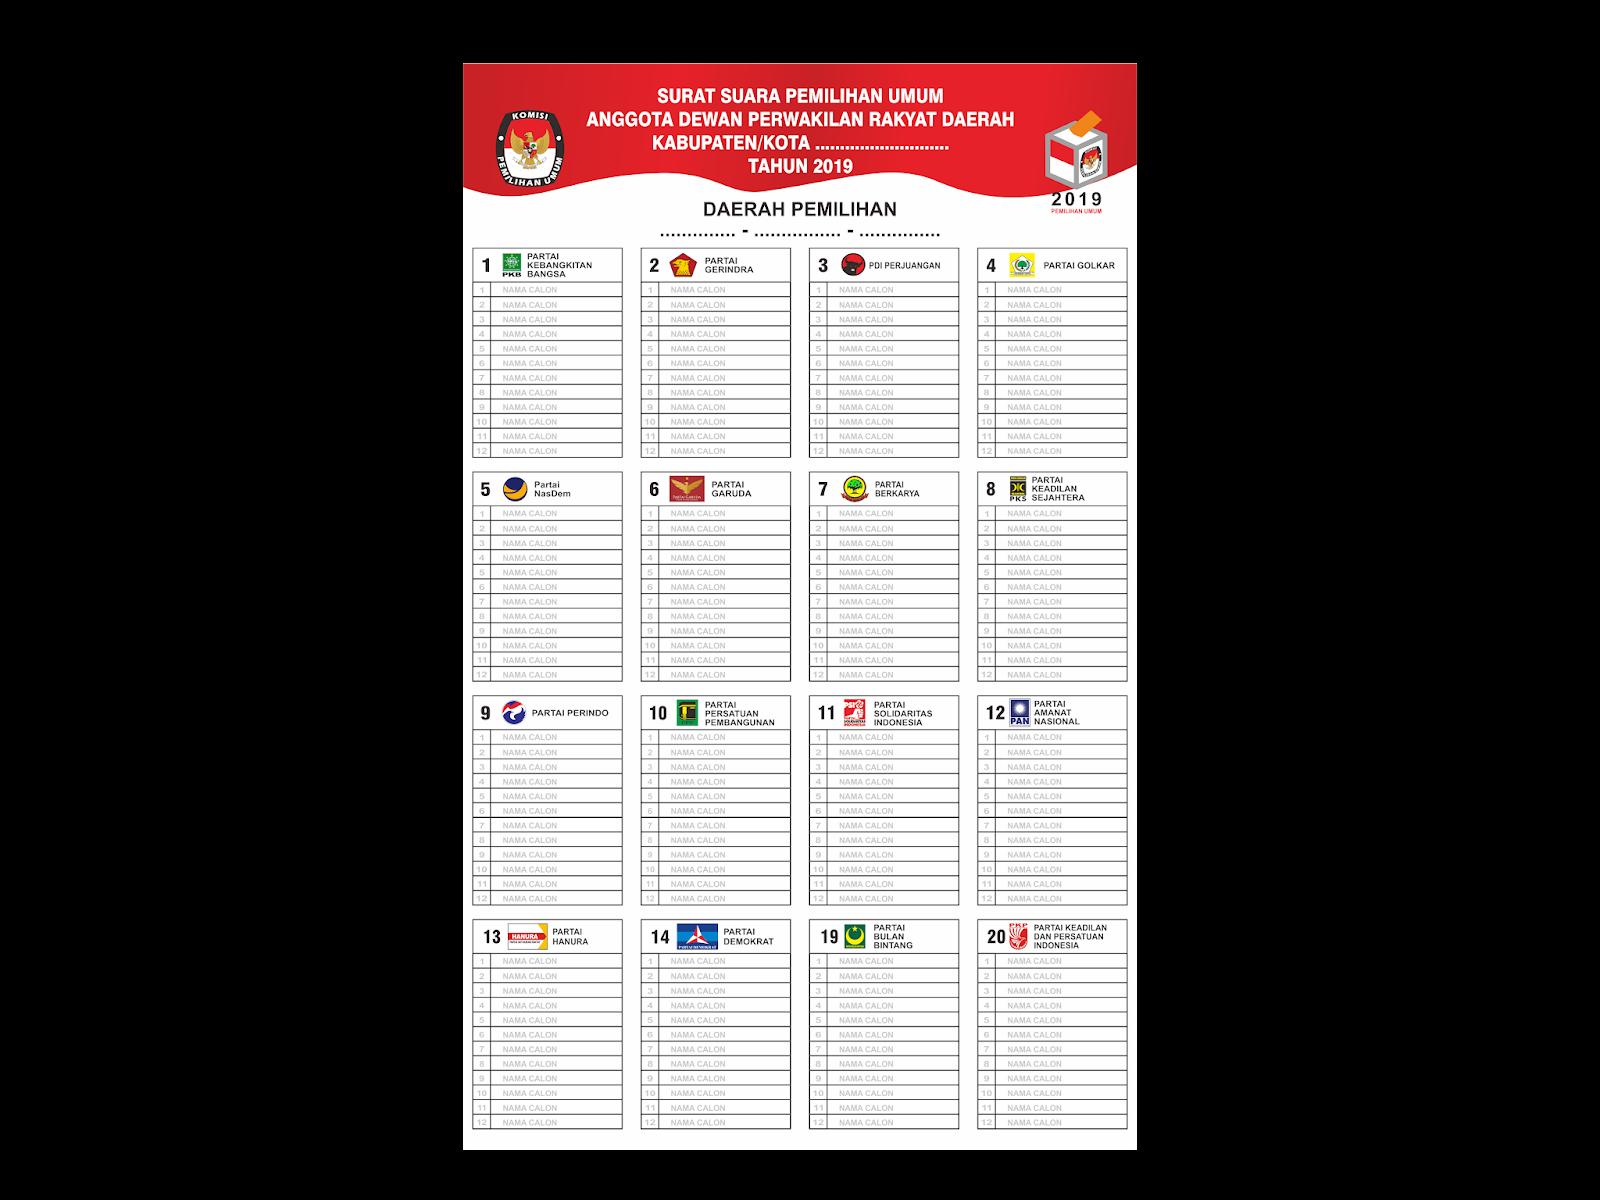 Download Contoh Surat Suara Pemilu Format Cdr Png Svg